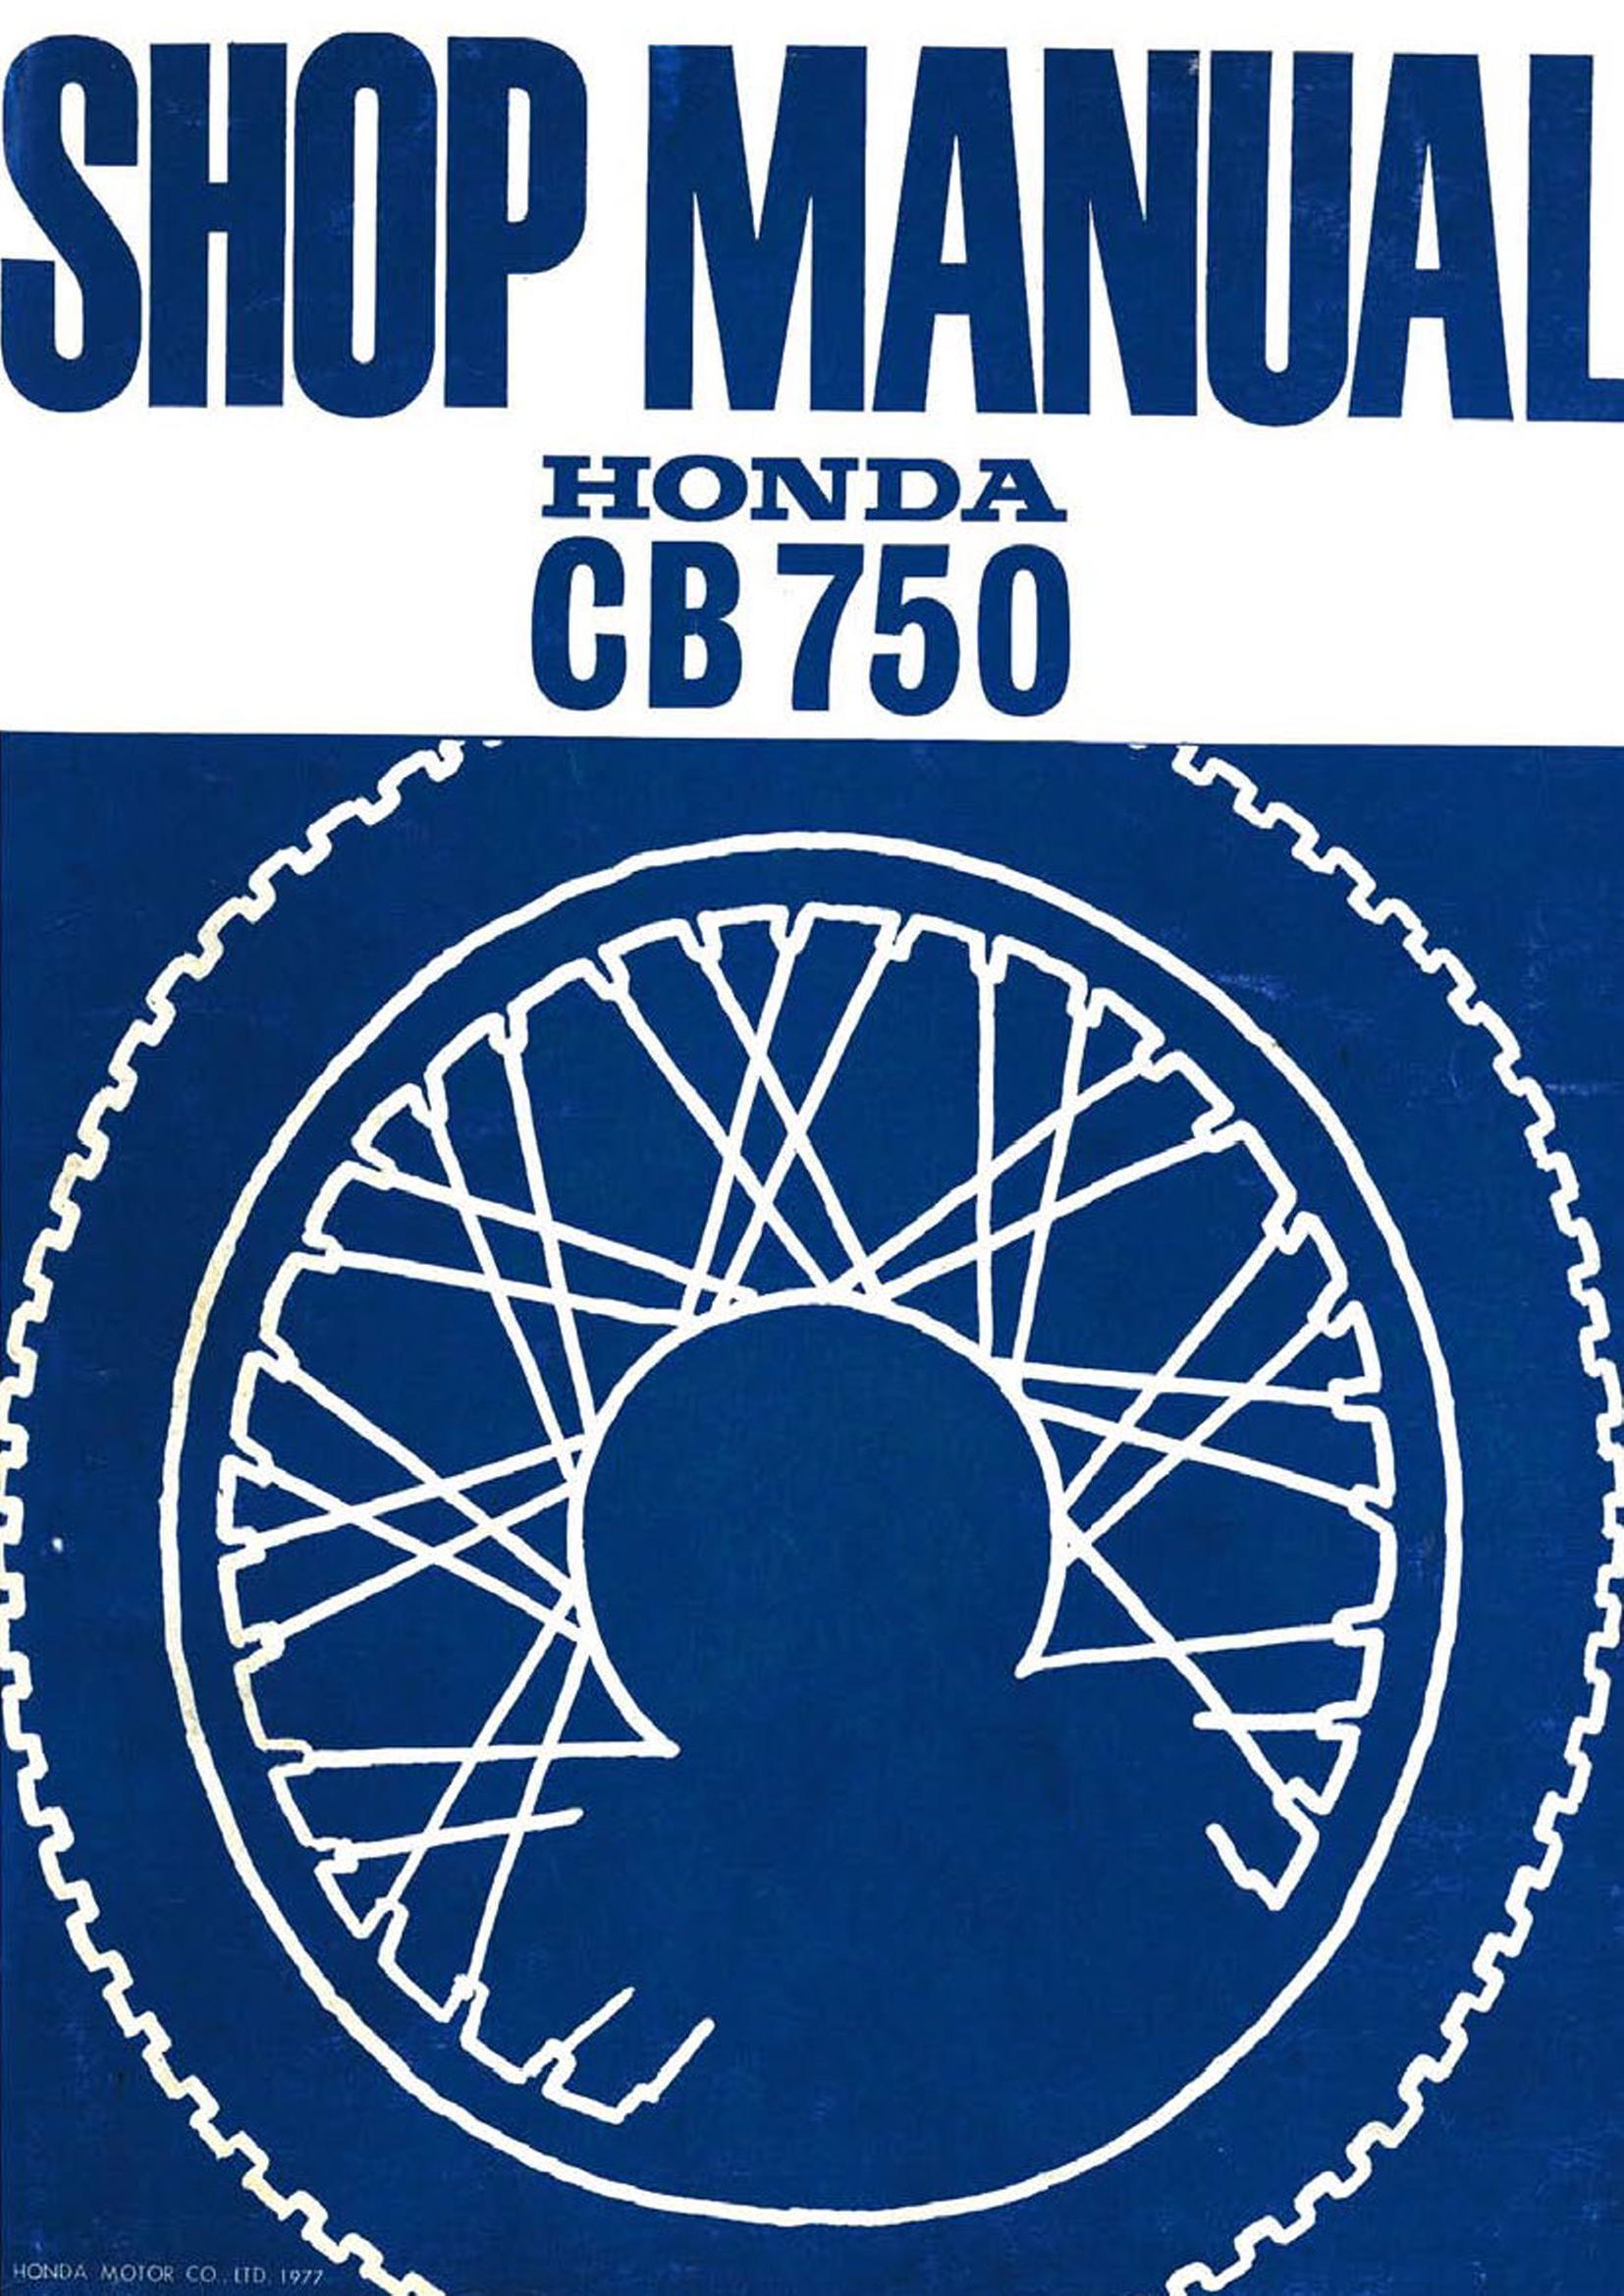 Workshop manual for Honda CB750 (1977)